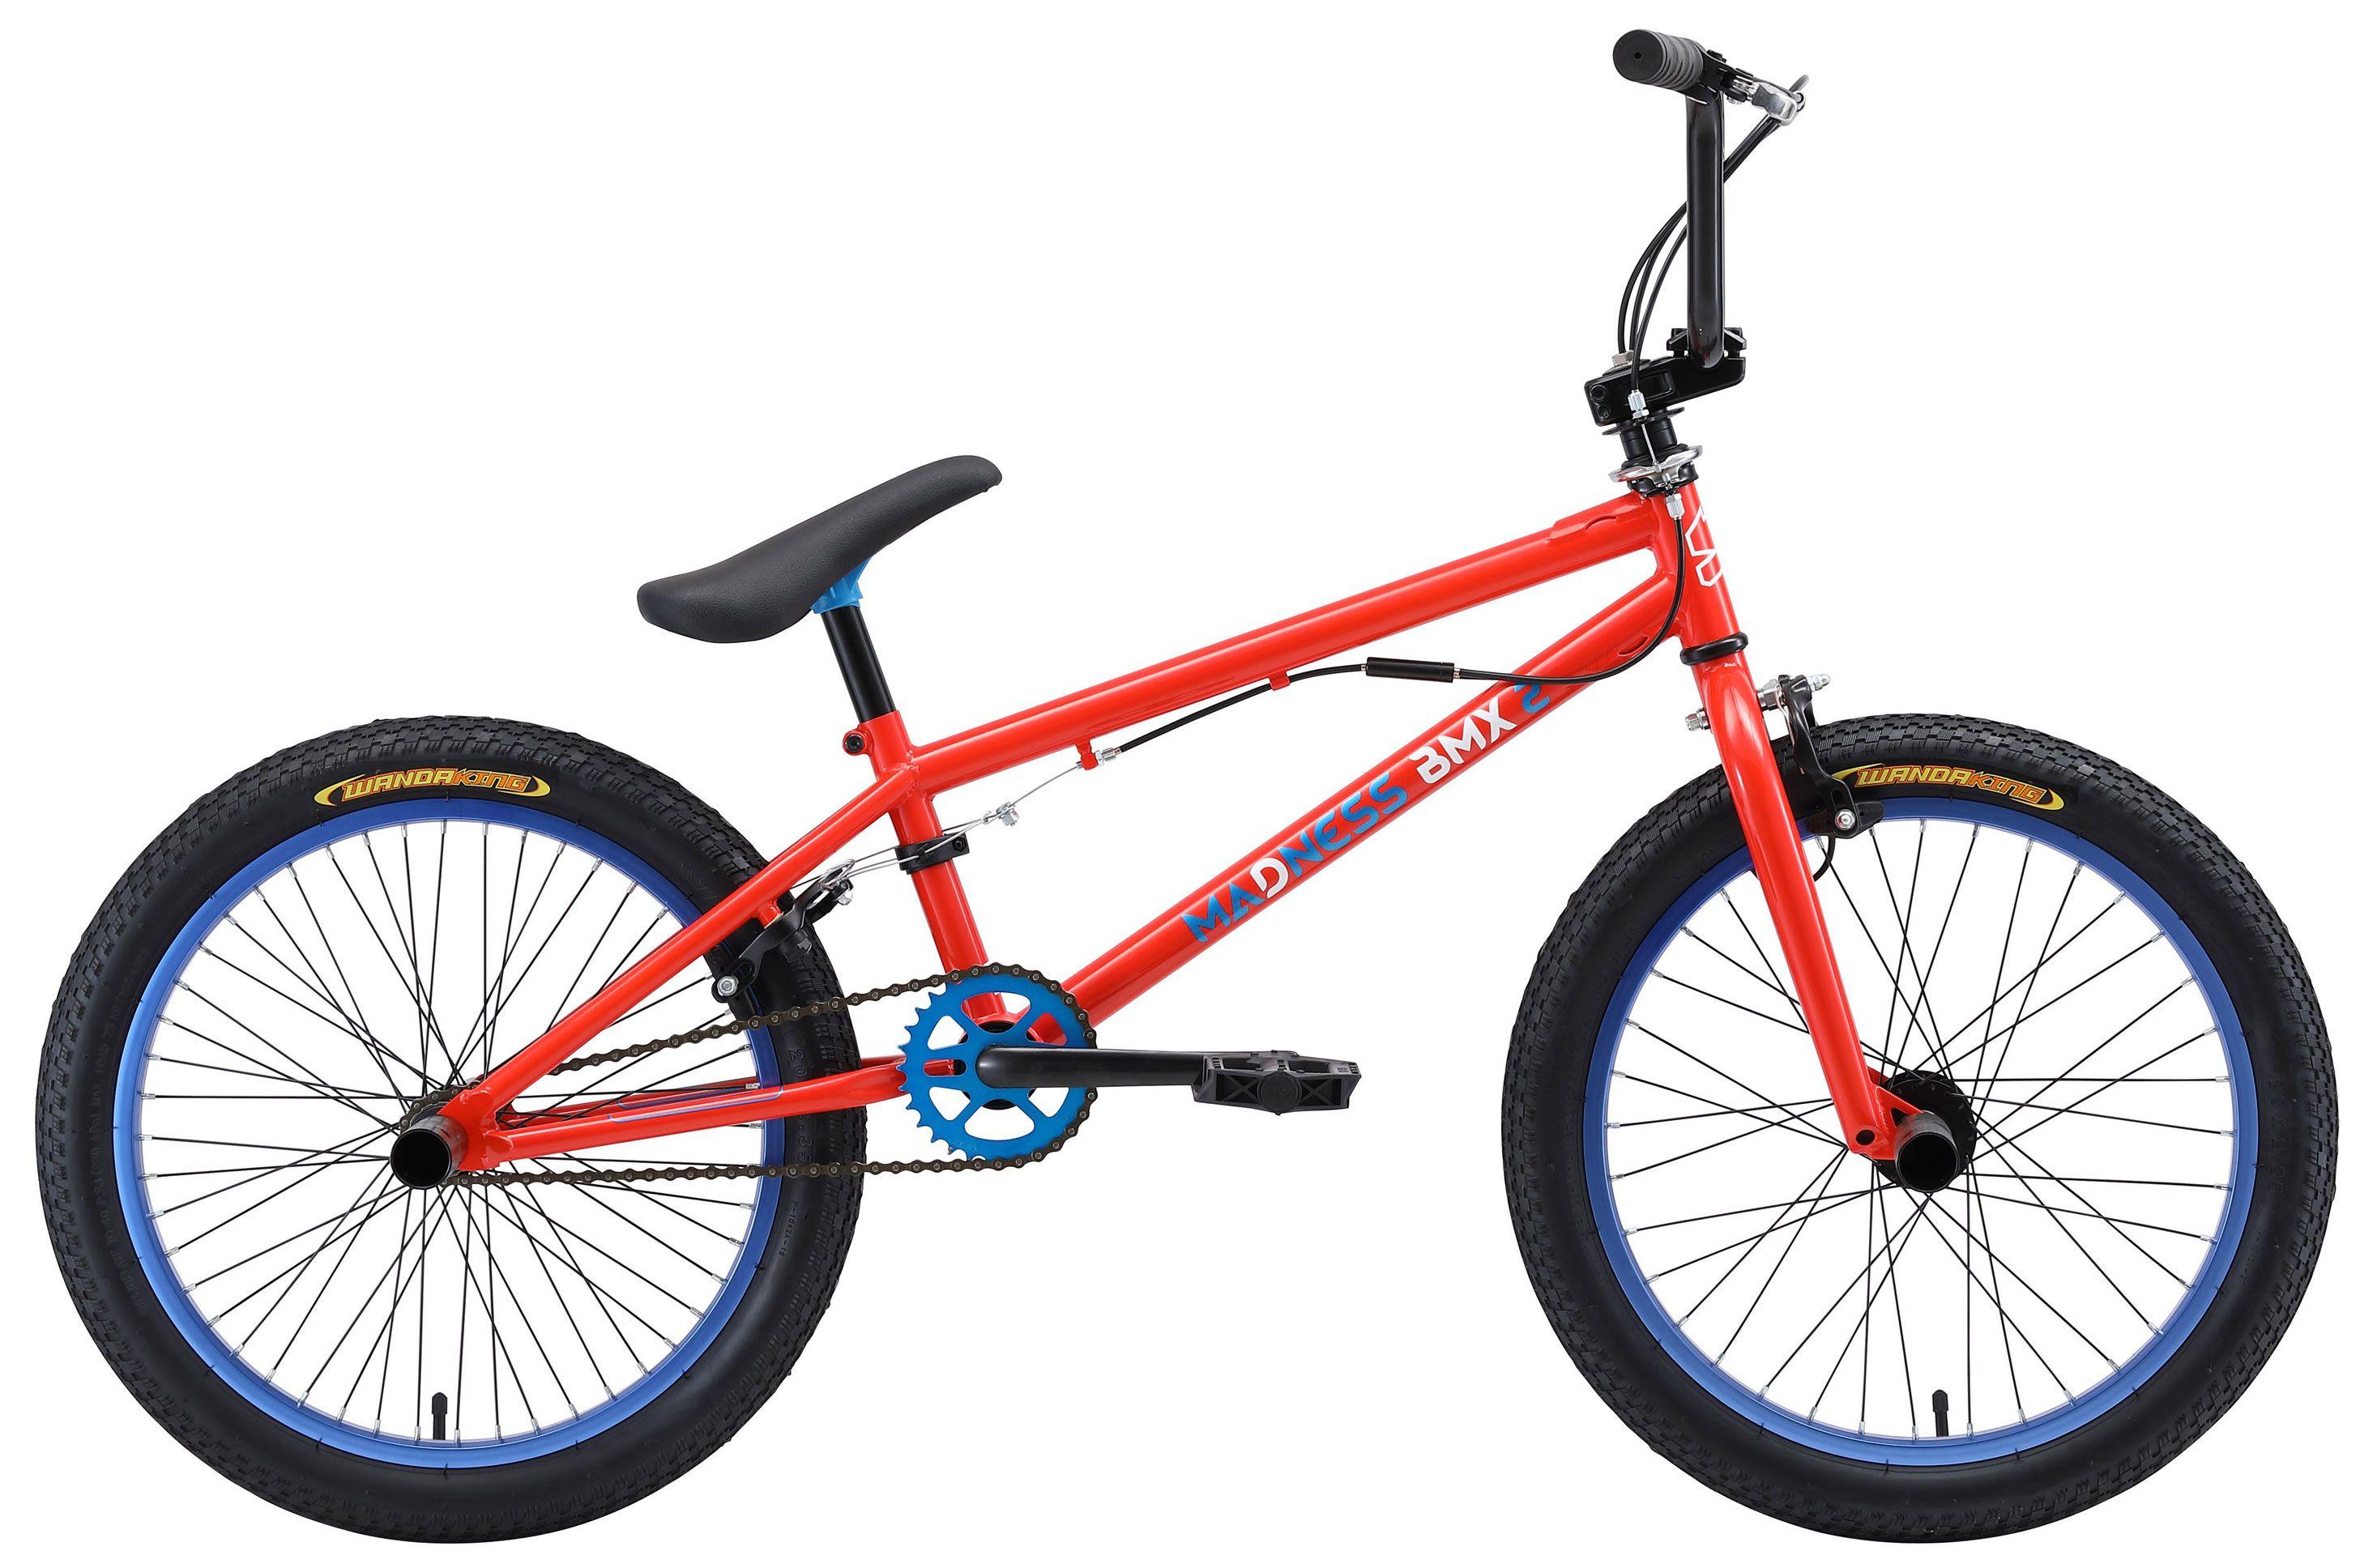 Велосипед Stark Madness BMX 2 2018,  Трюковые  - артикул:288227